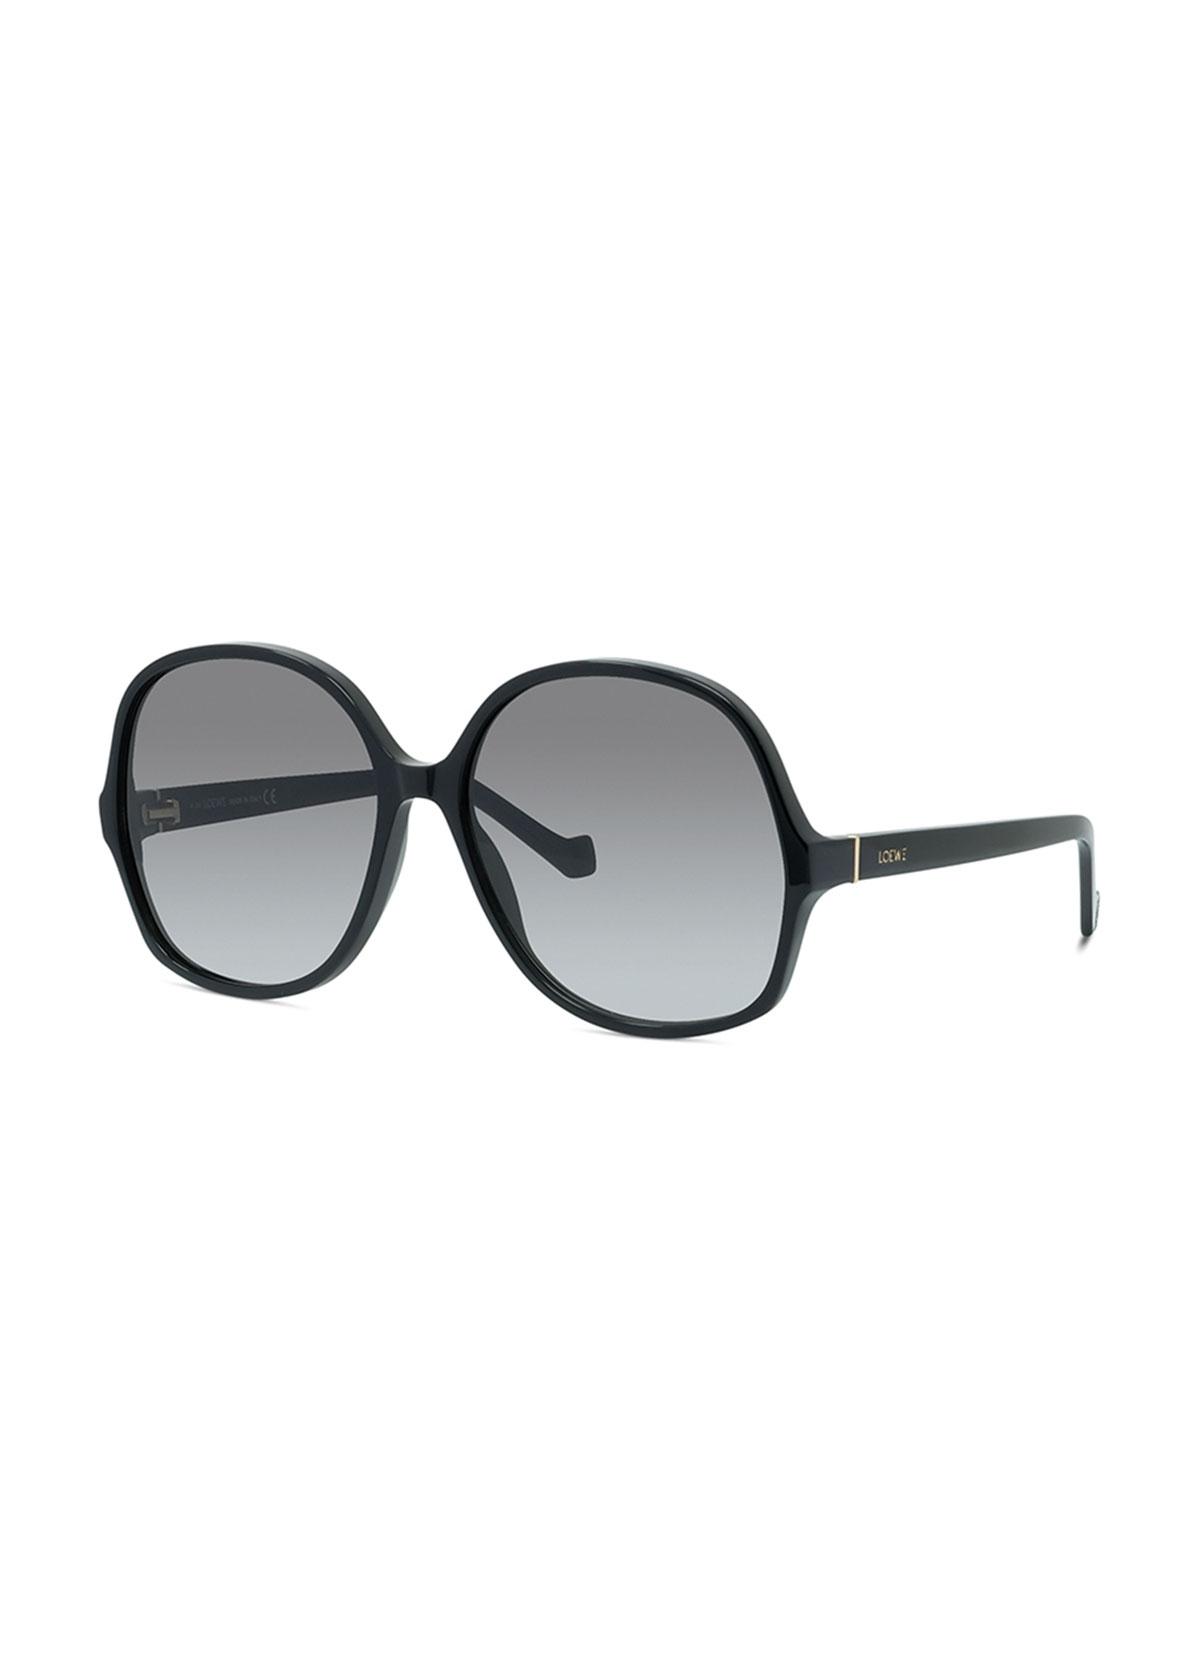 Oversized Round Gradient Sunglasses